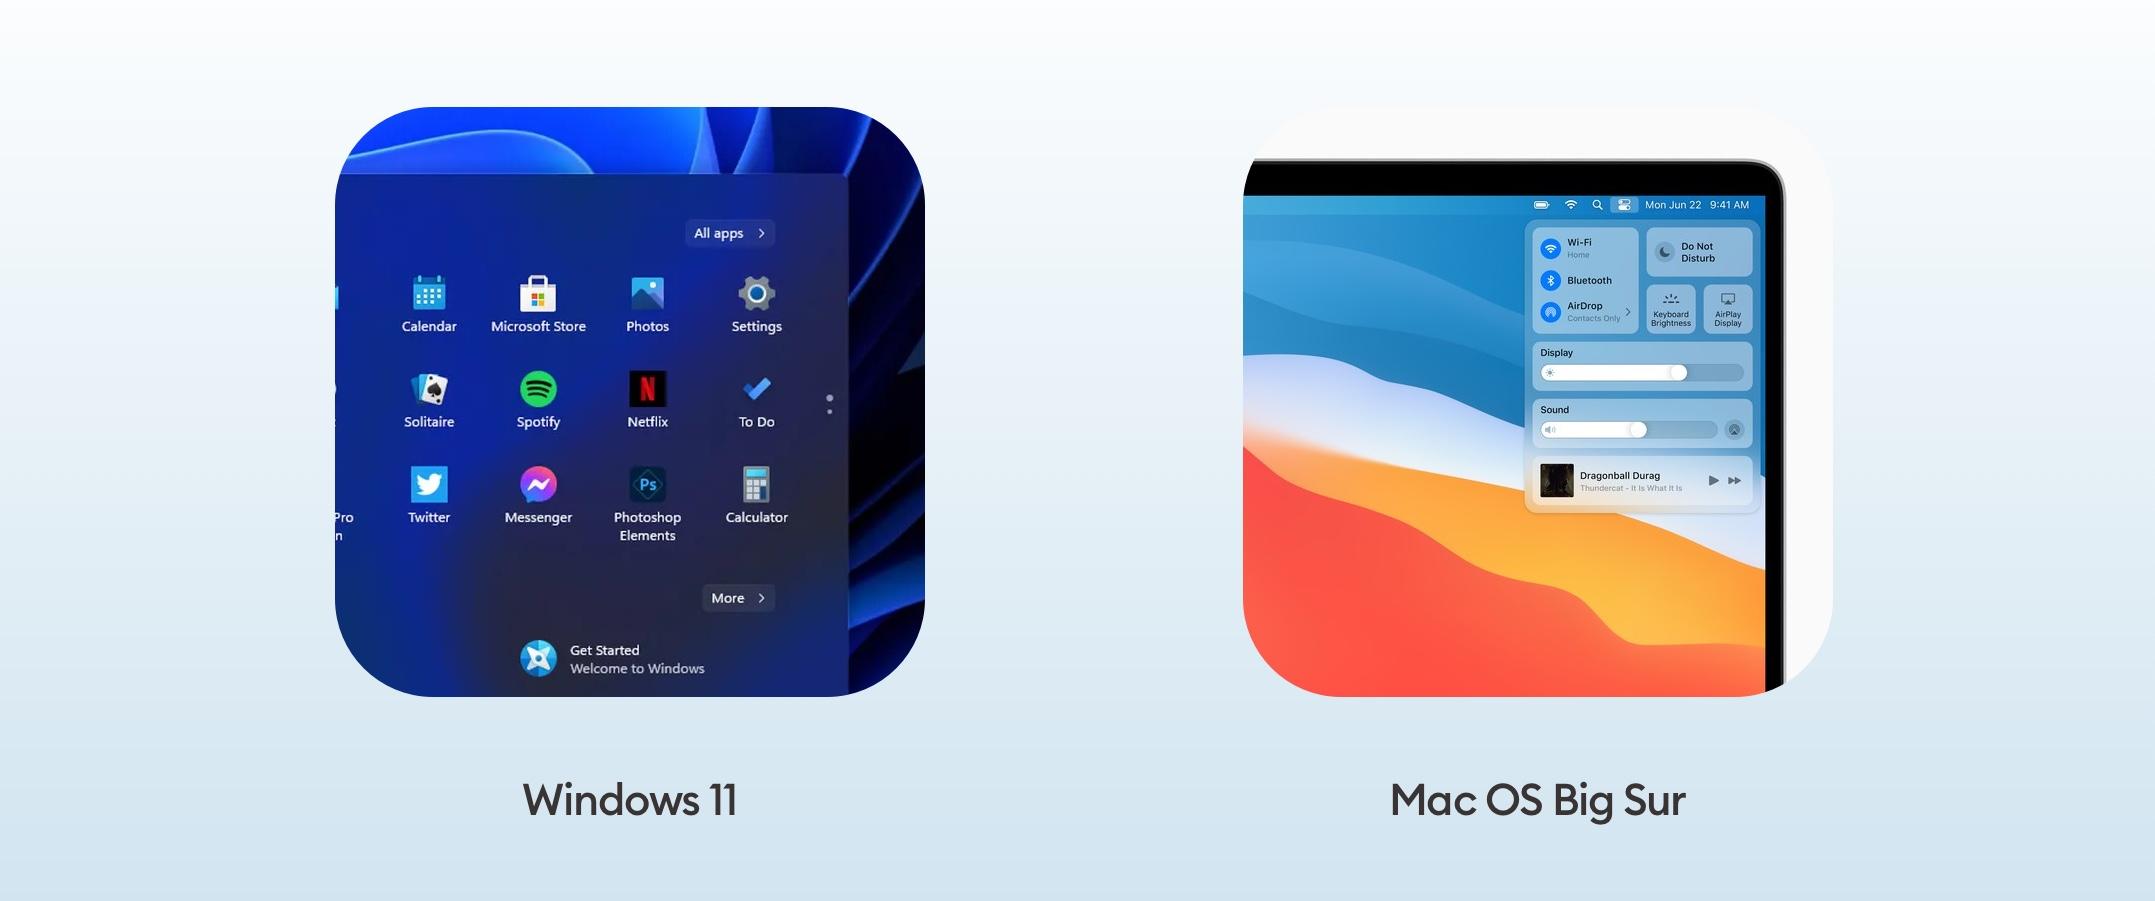 Windows 11 and Mac OS Big Sur usage of Glassmorphism UI trend